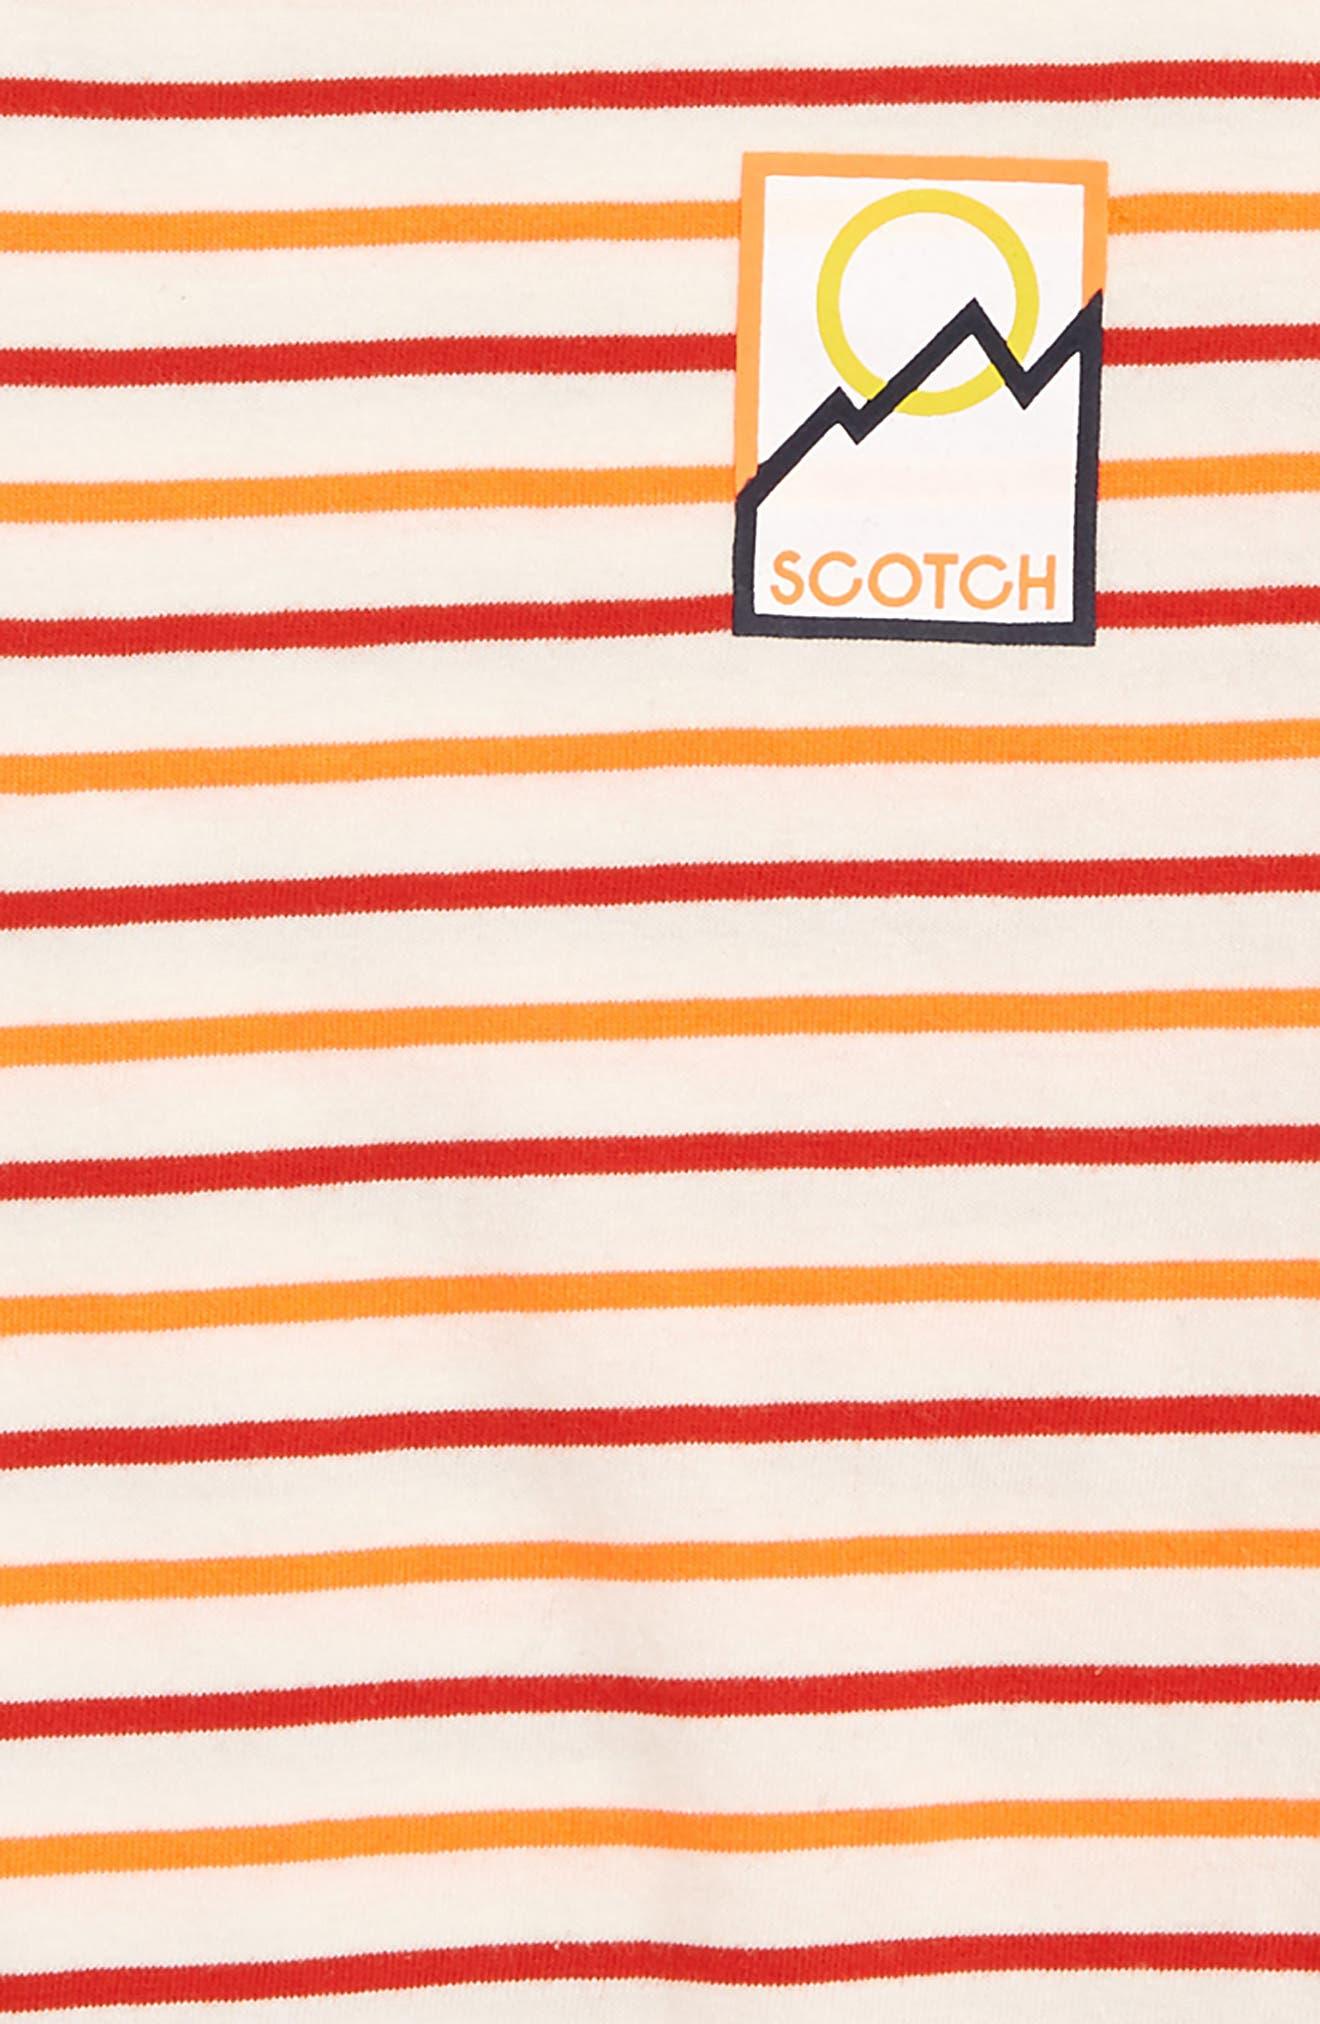 Regular Fit T-Shirt,                             Alternate thumbnail 2, color,                             ORANGE